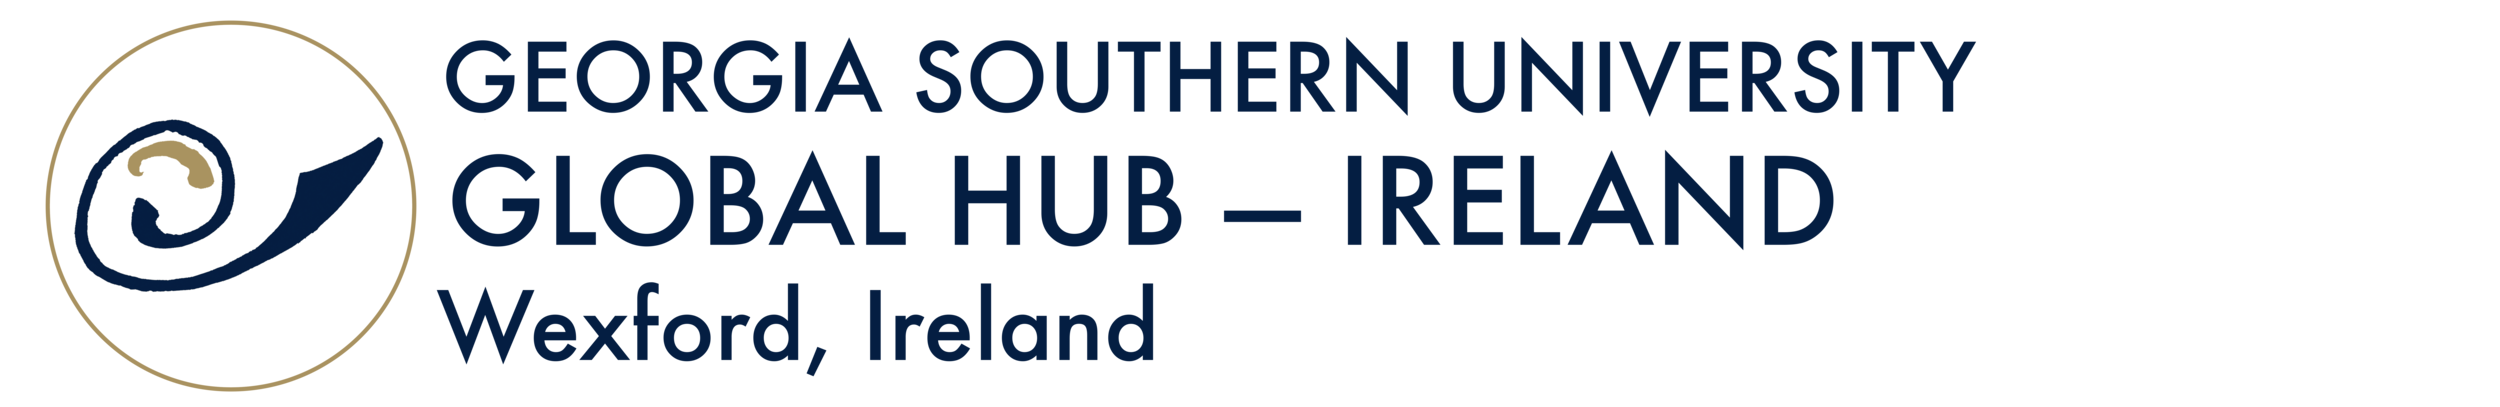 Logo-GlobalHub-GoldRing-WhiteFill.png